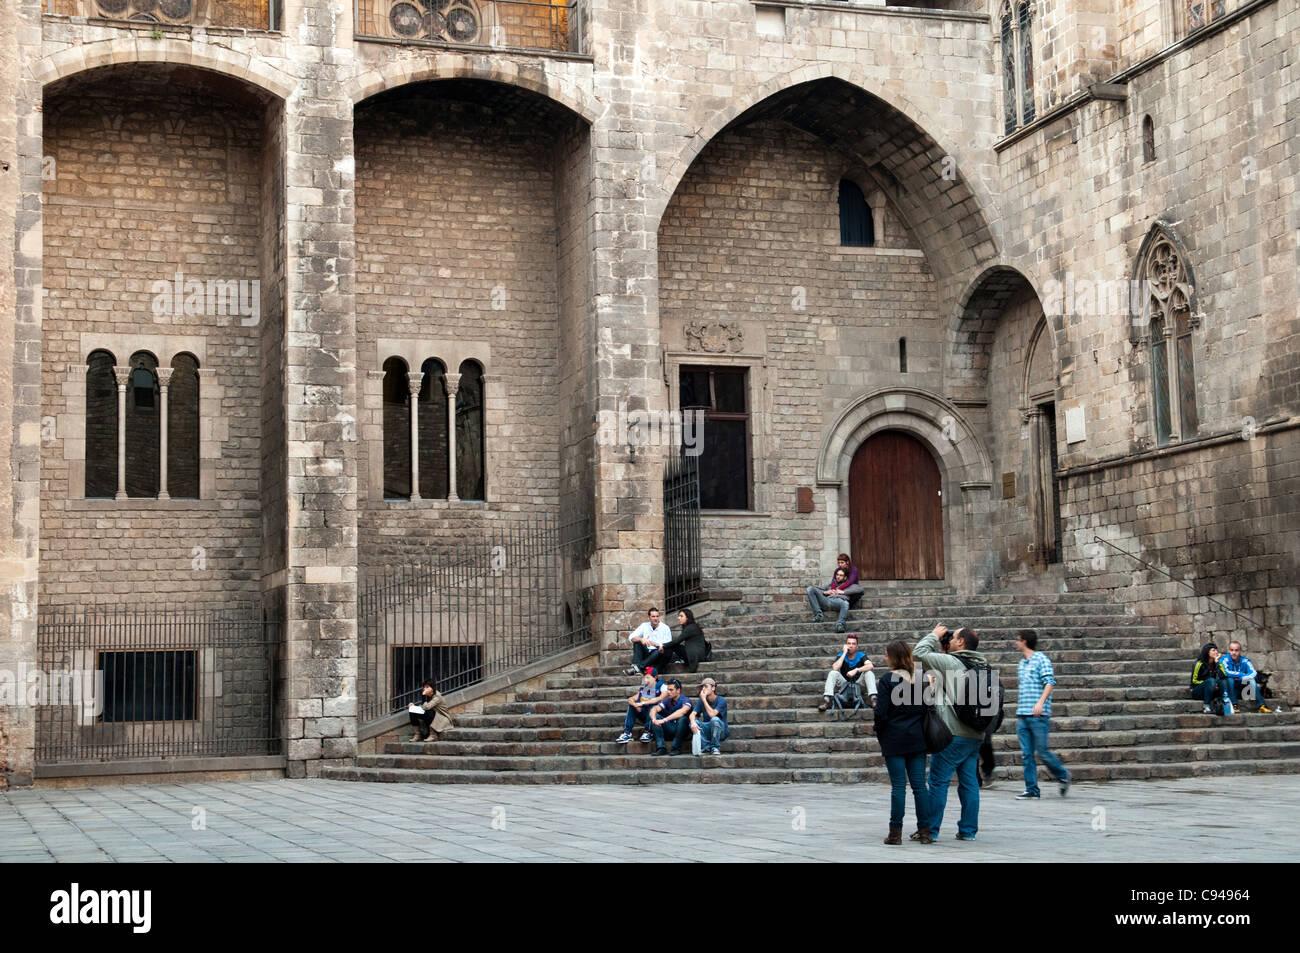 Palau Reial, Placa del Rei, Barcelona, Spain - Stock Image